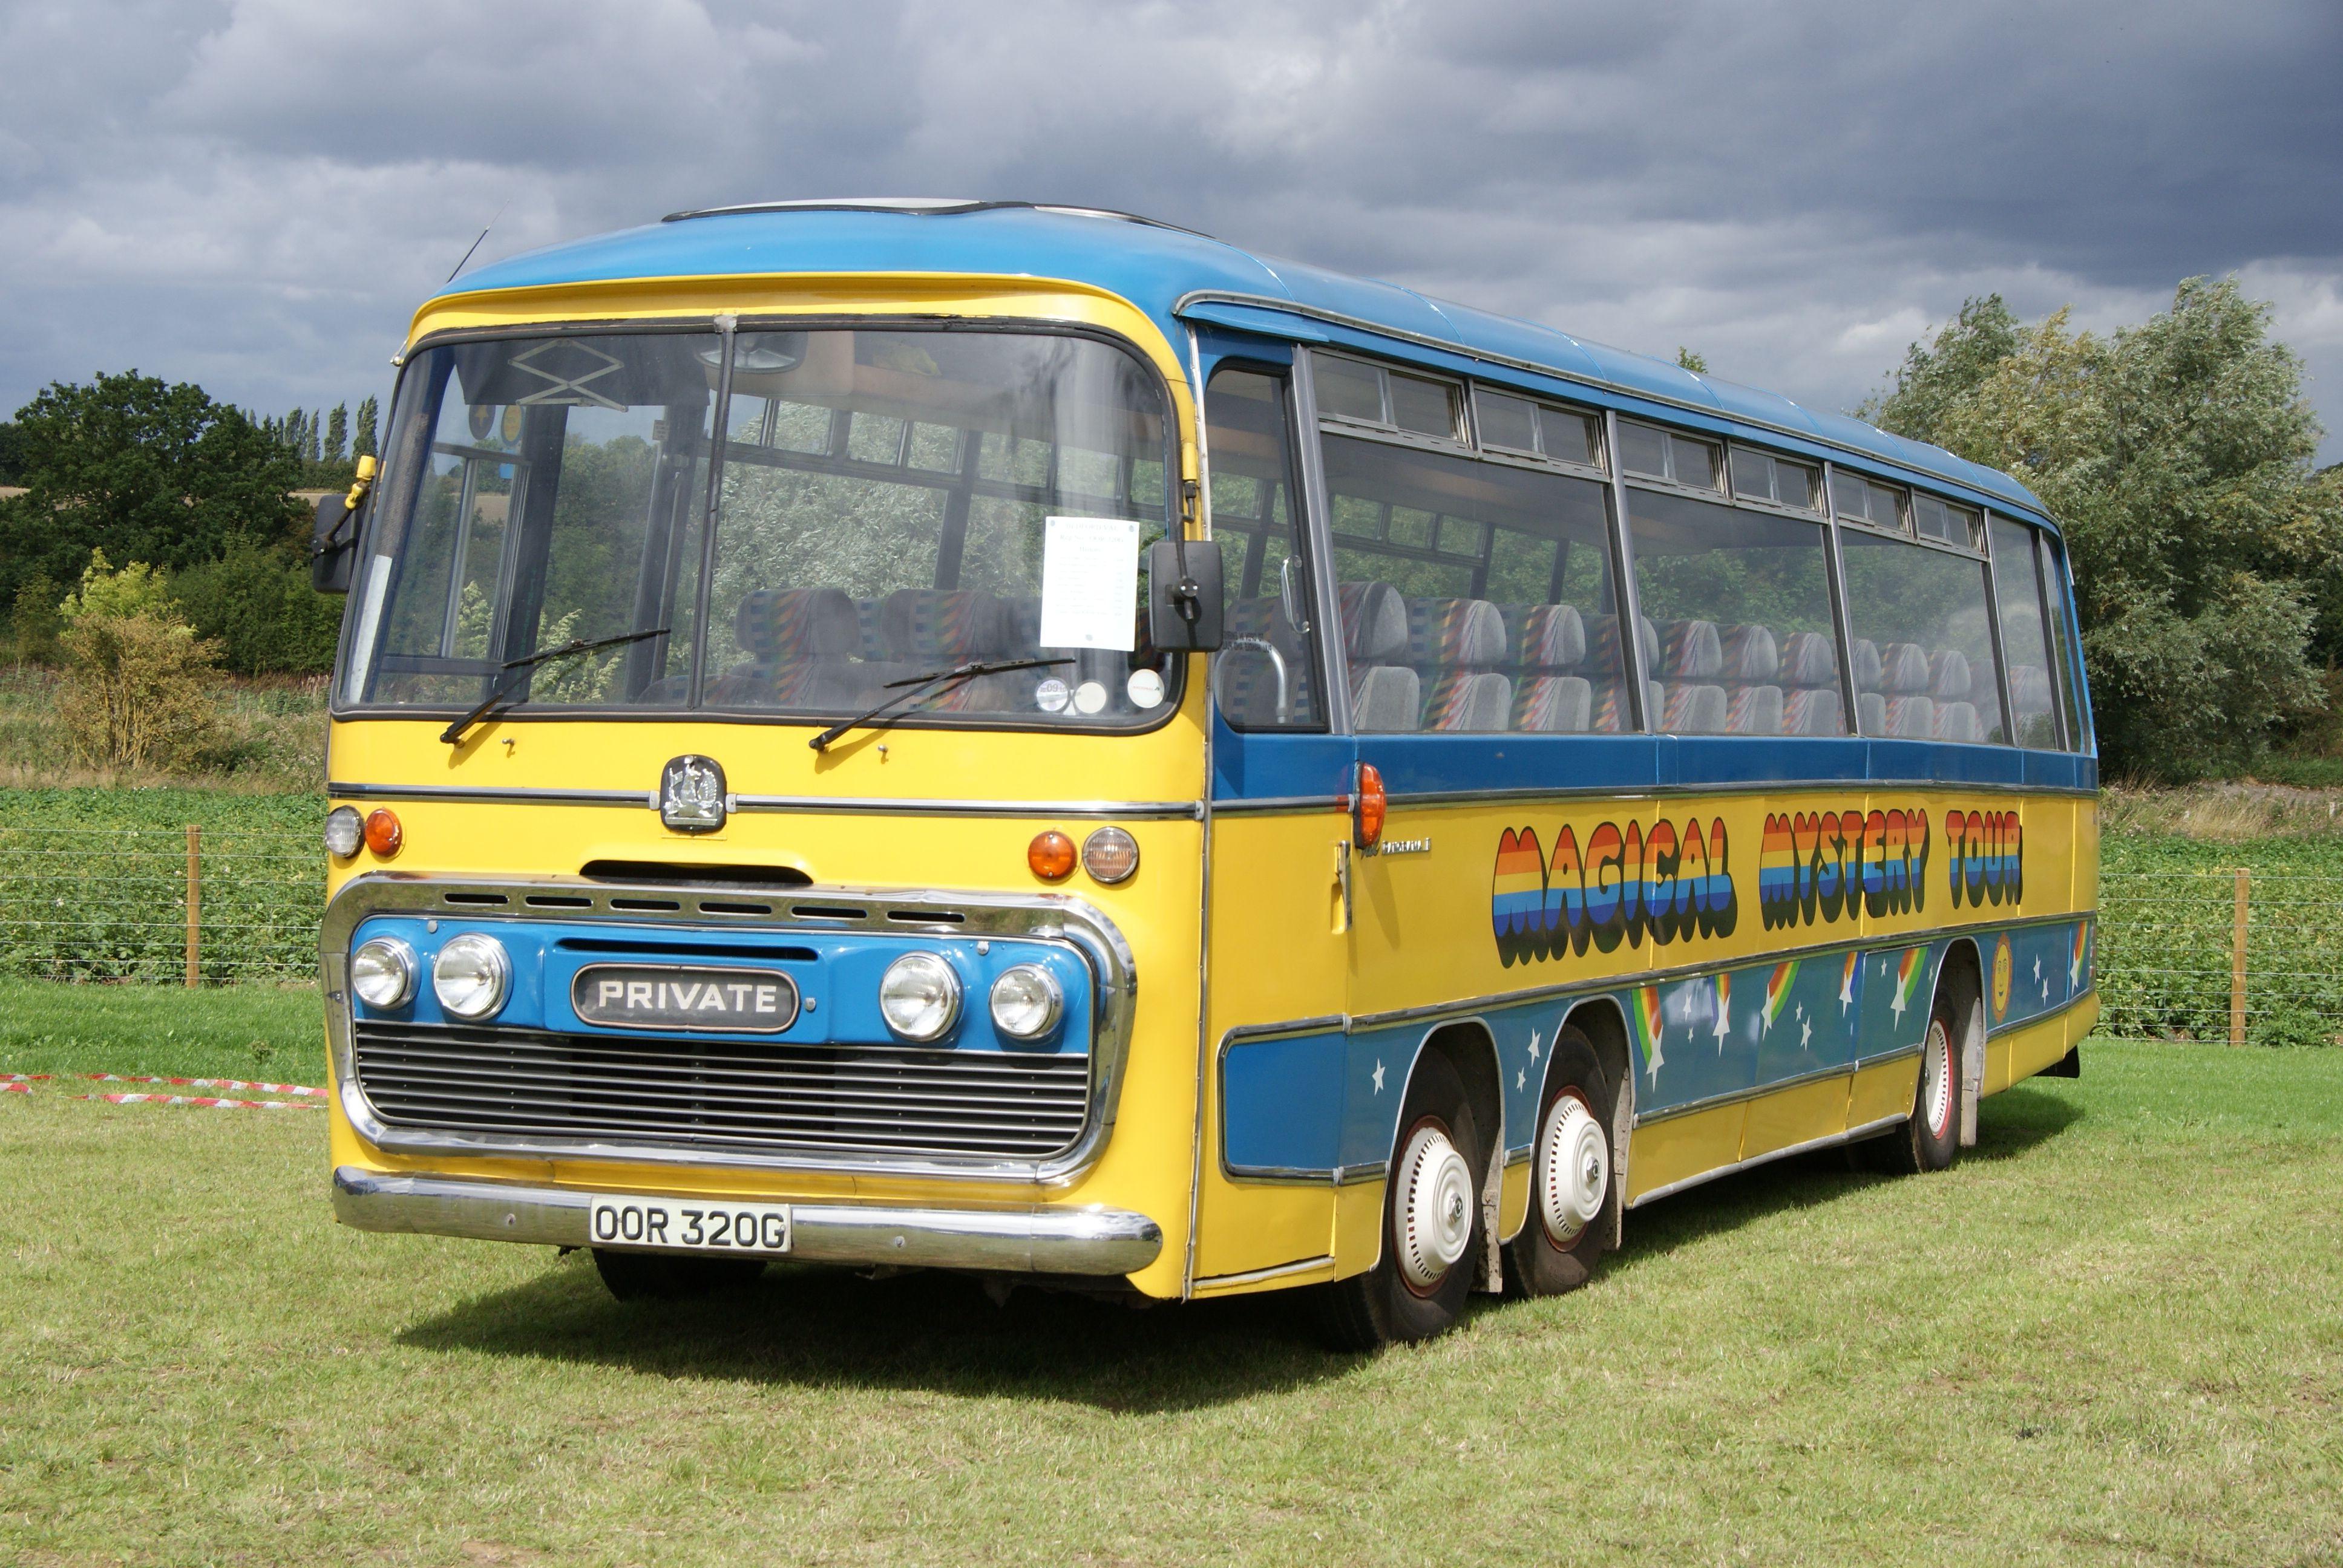 Tour Bus Royalty Free Stock Photography - Image: tausche bet at home gs von cupoco gegen bet at  - mydealz.de 11363087